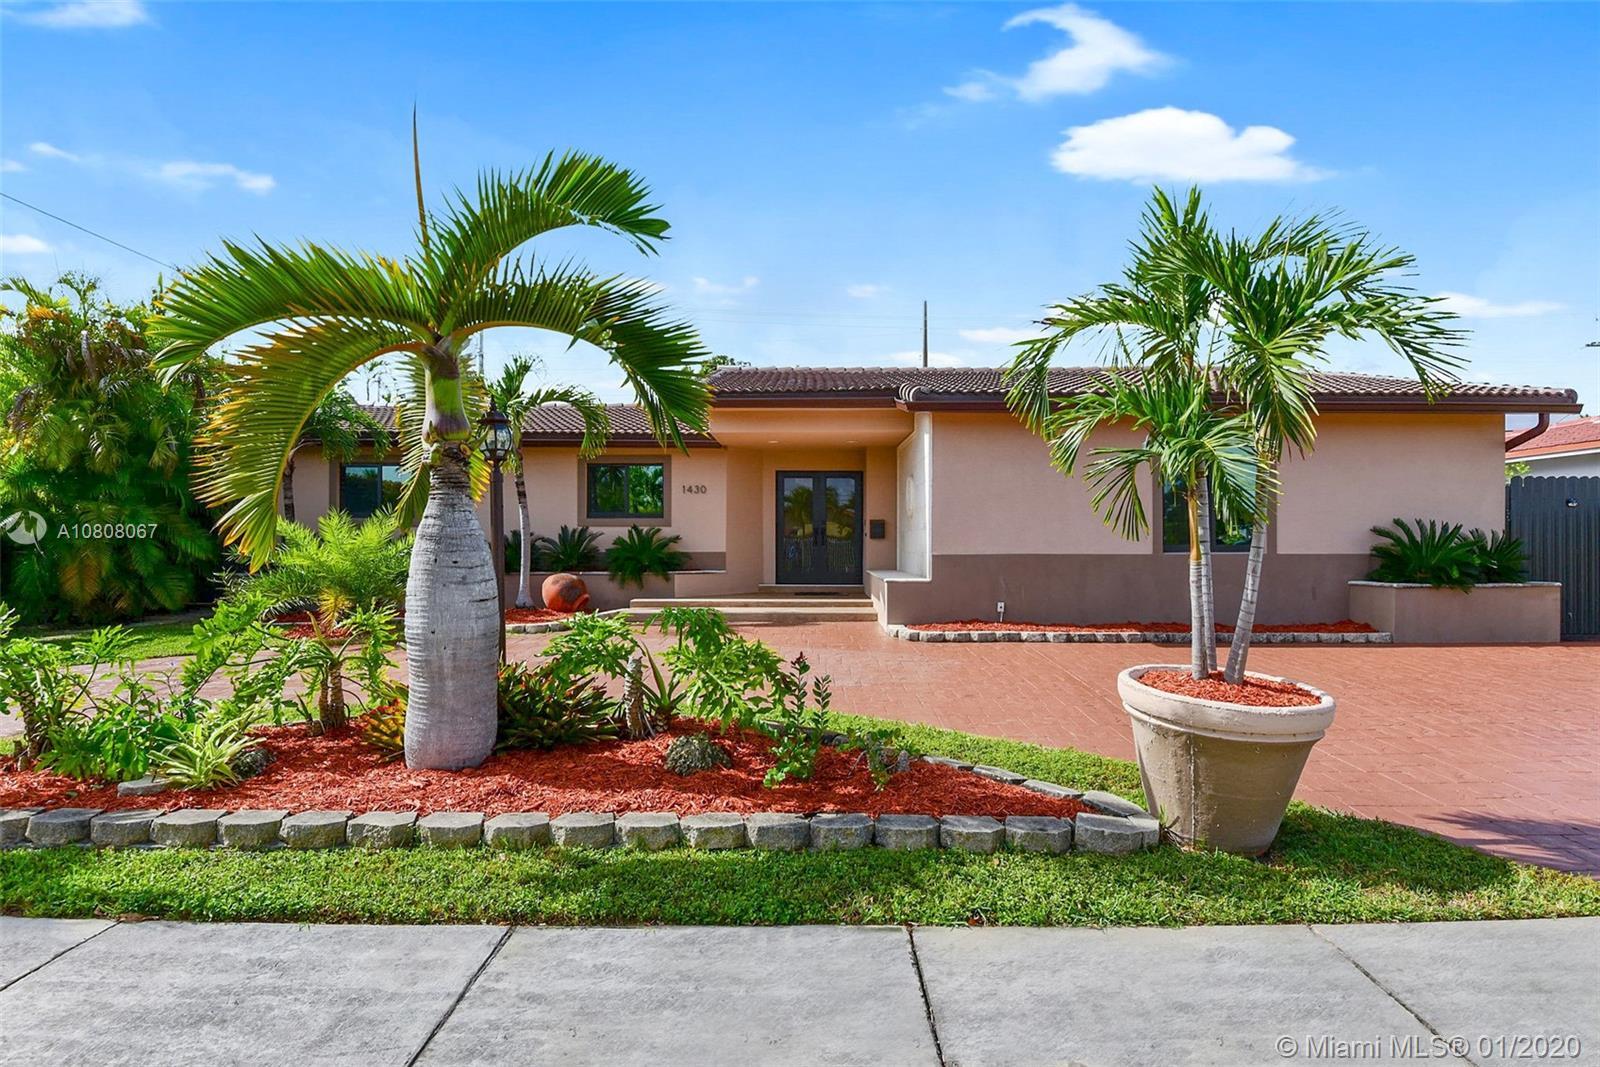 1430 SW 101st Ave, Miami, FL 33174